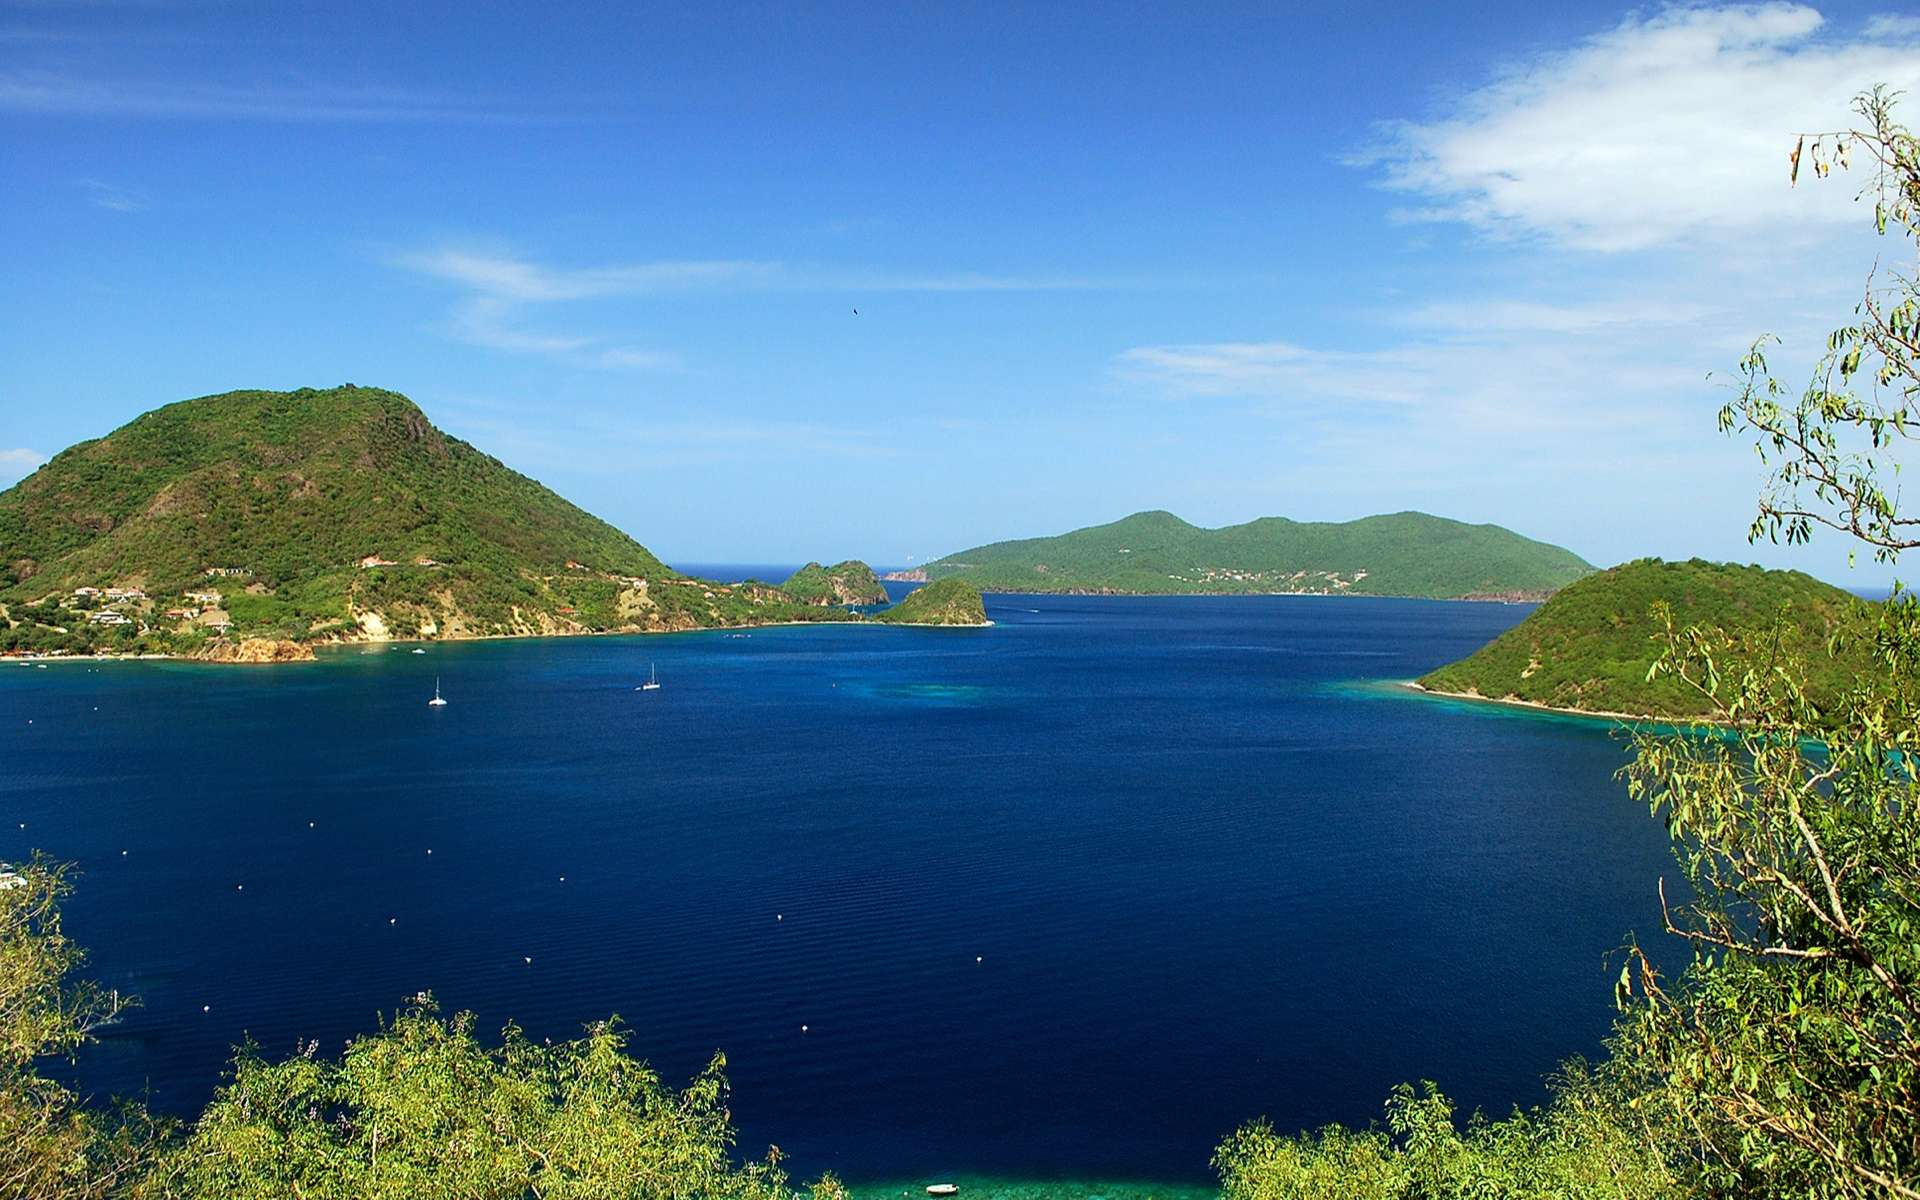 GrANoLA, la grande île des Antilles aujourd'hui disparue. © raybecca, Adobe Stock